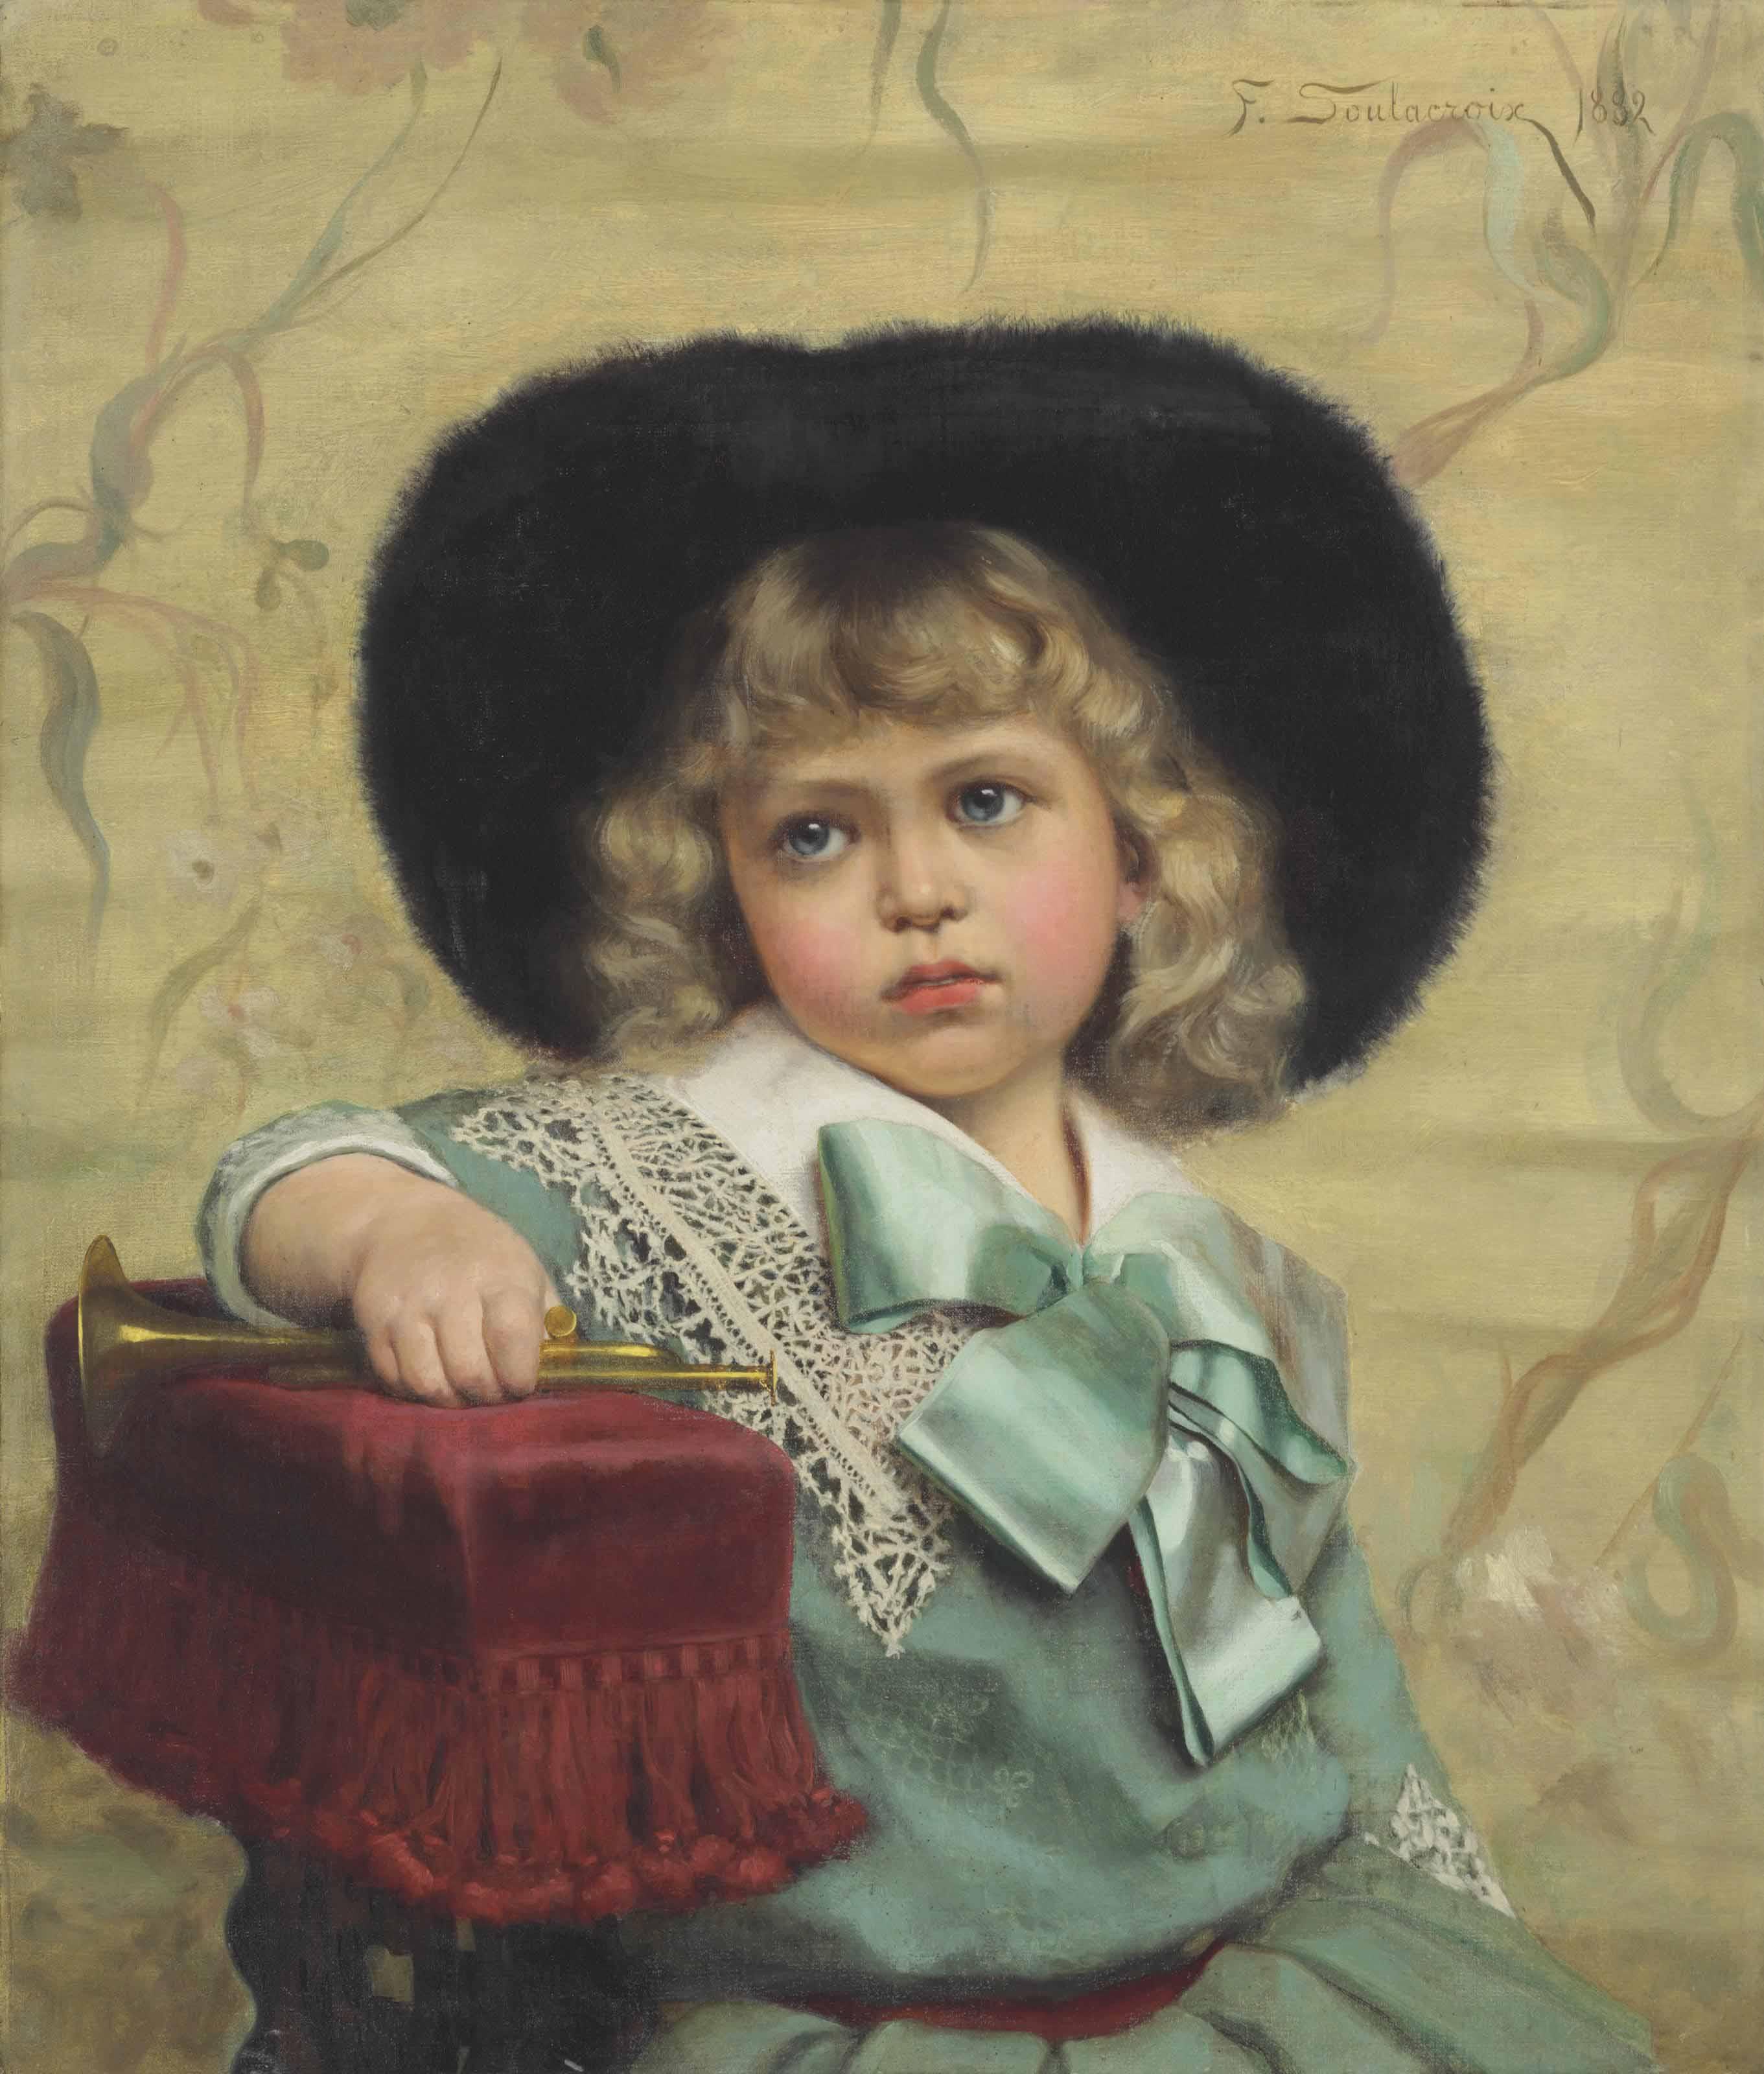 The Little Bugle Boy